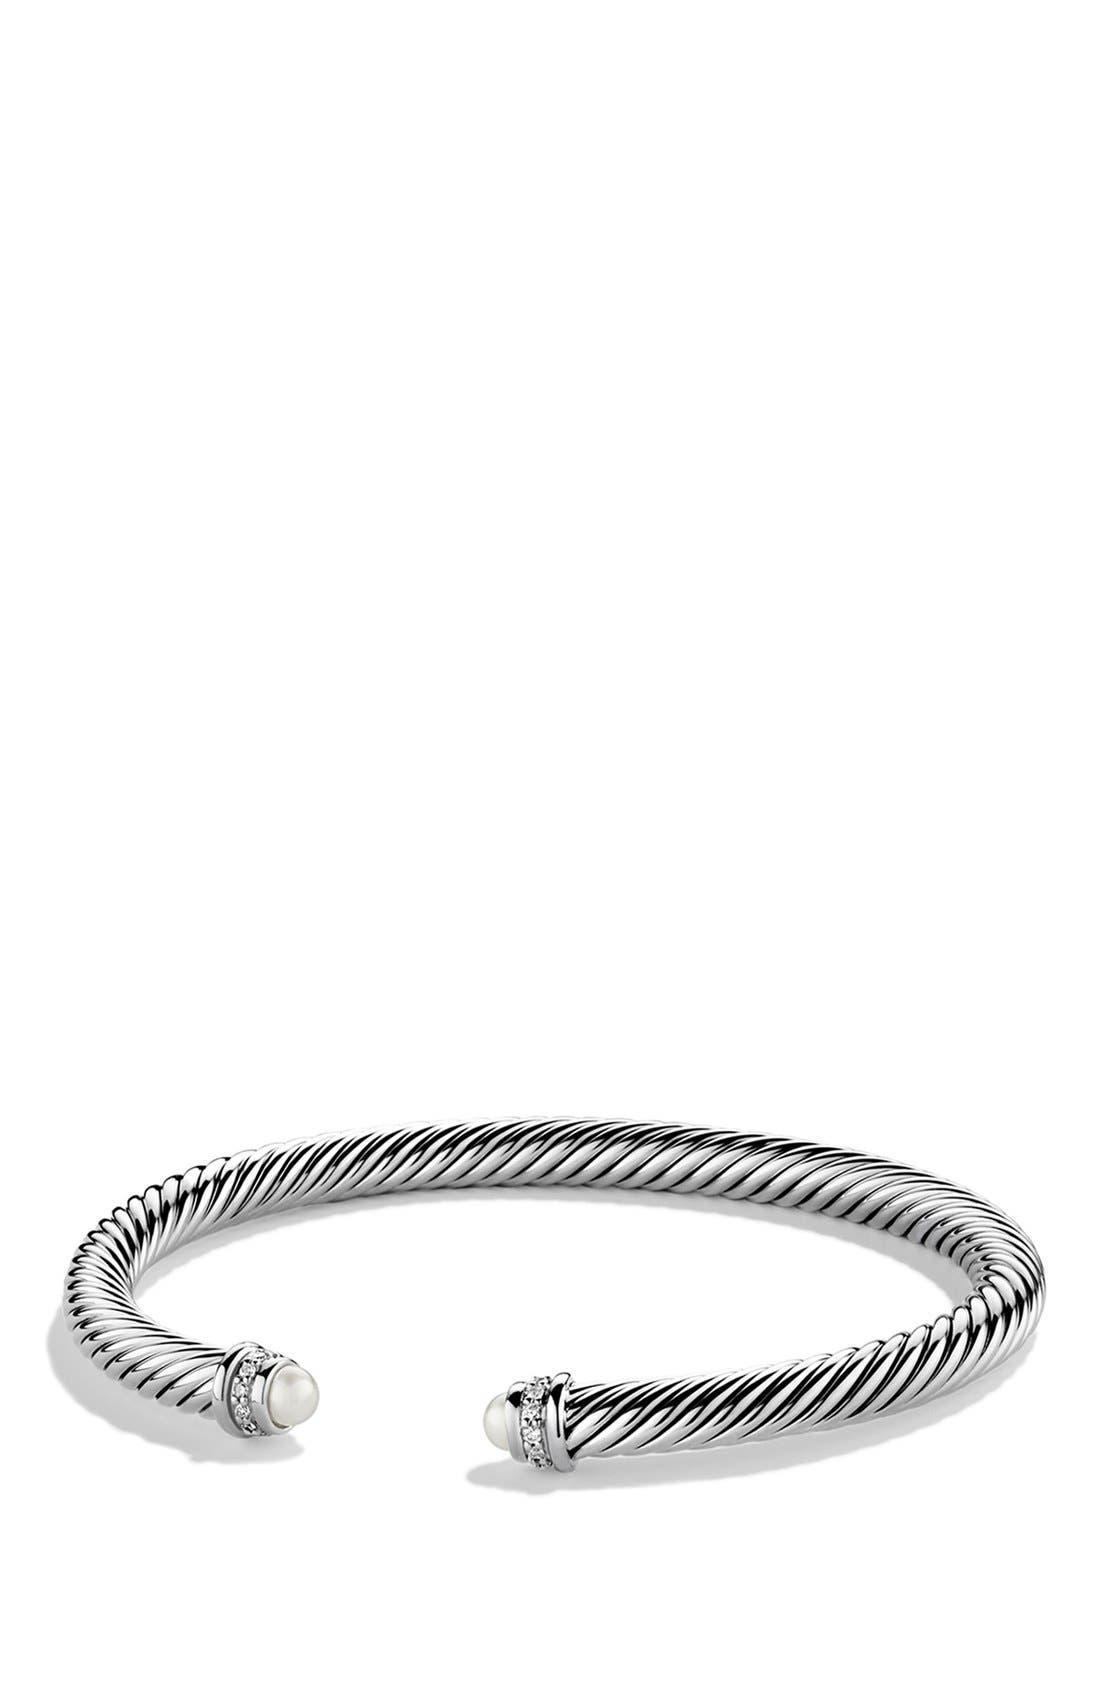 Womens White Cuff Bracelets Nordstrom